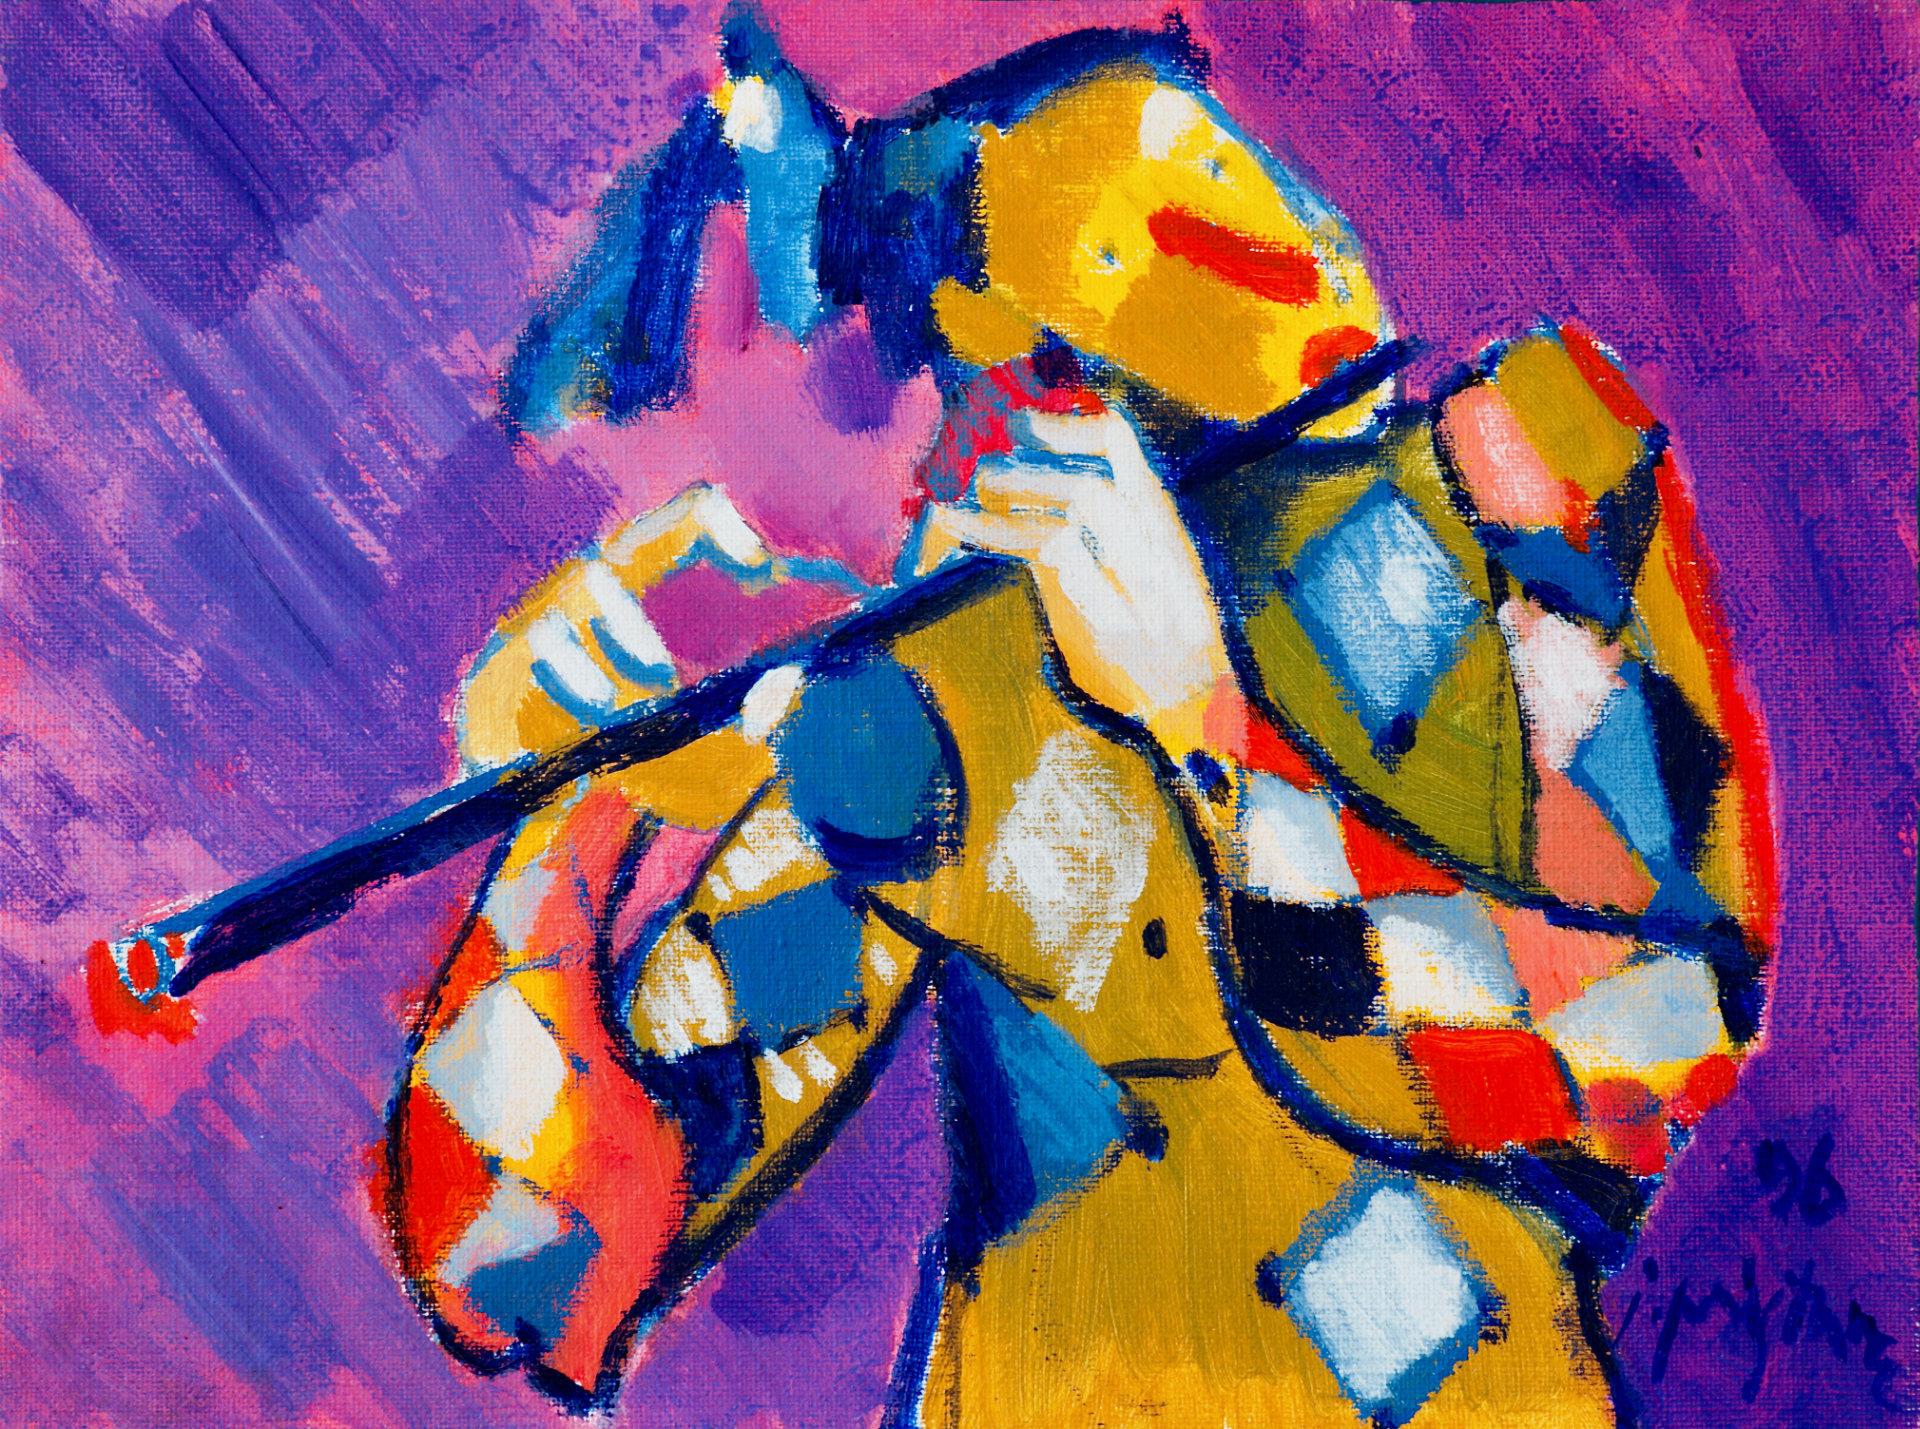 Harlekin   1996, akril na platno, 40 x 30 cm